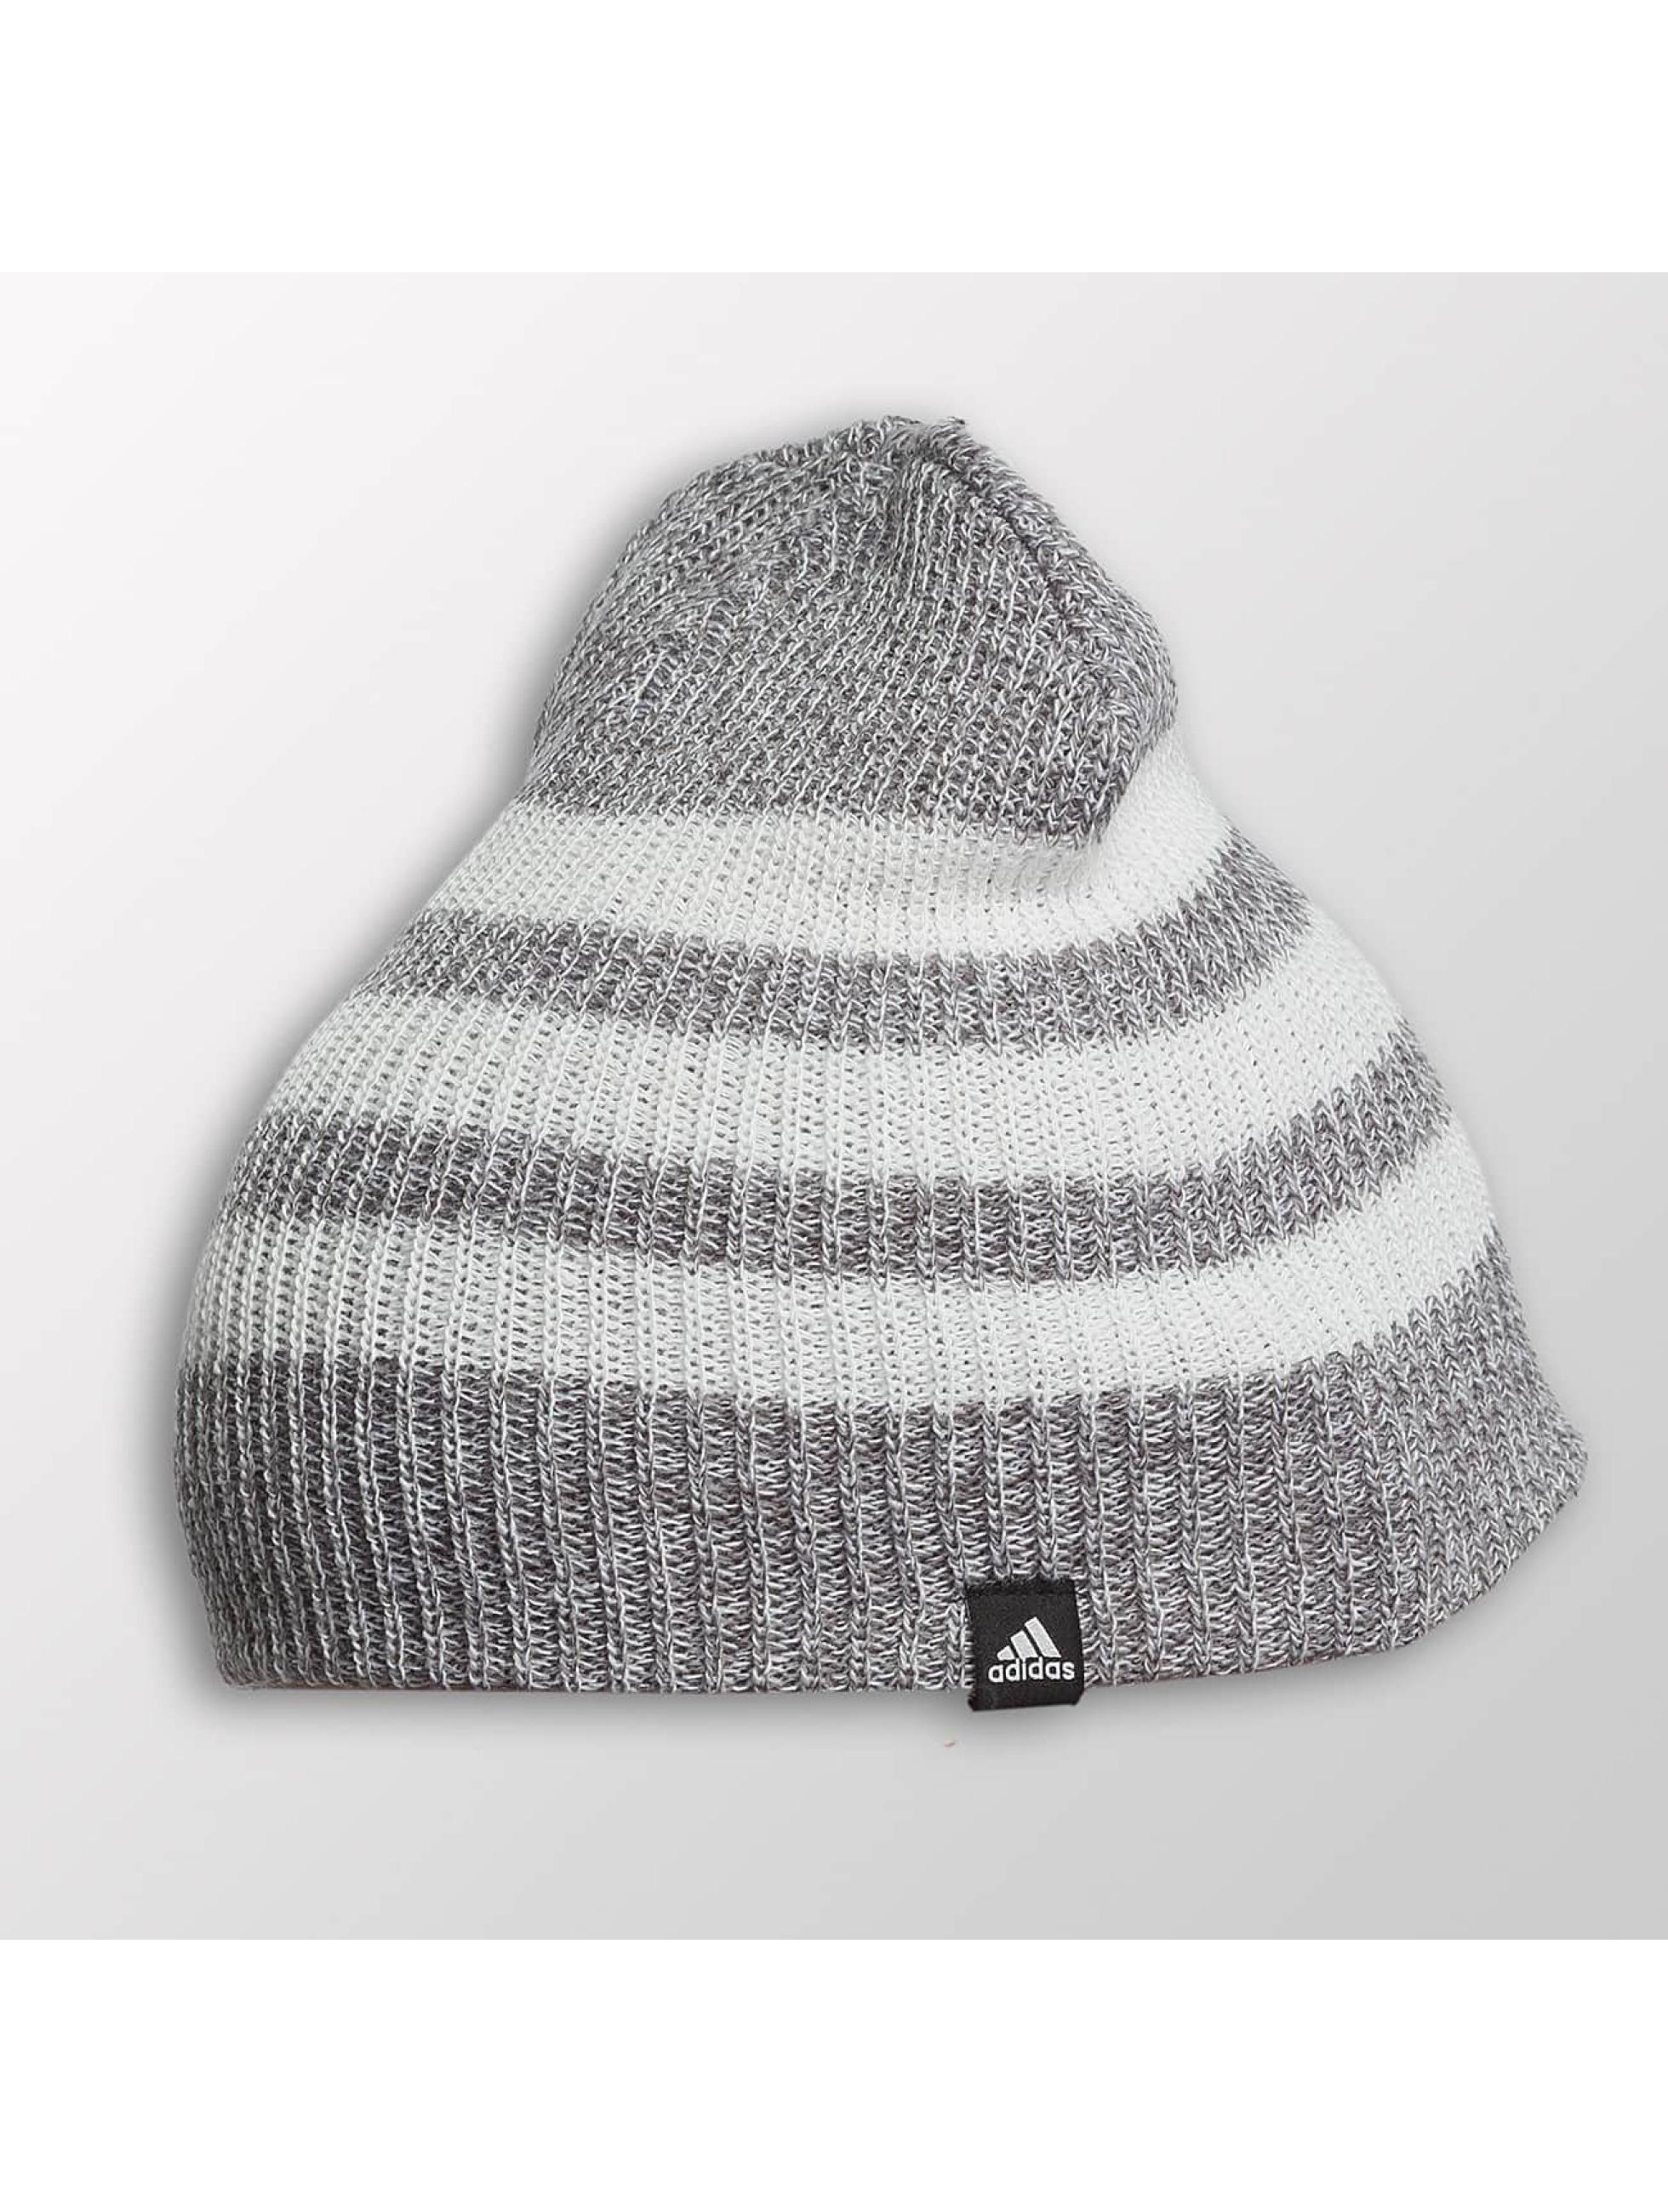 adidas Hat-1 Adidas 3S gray